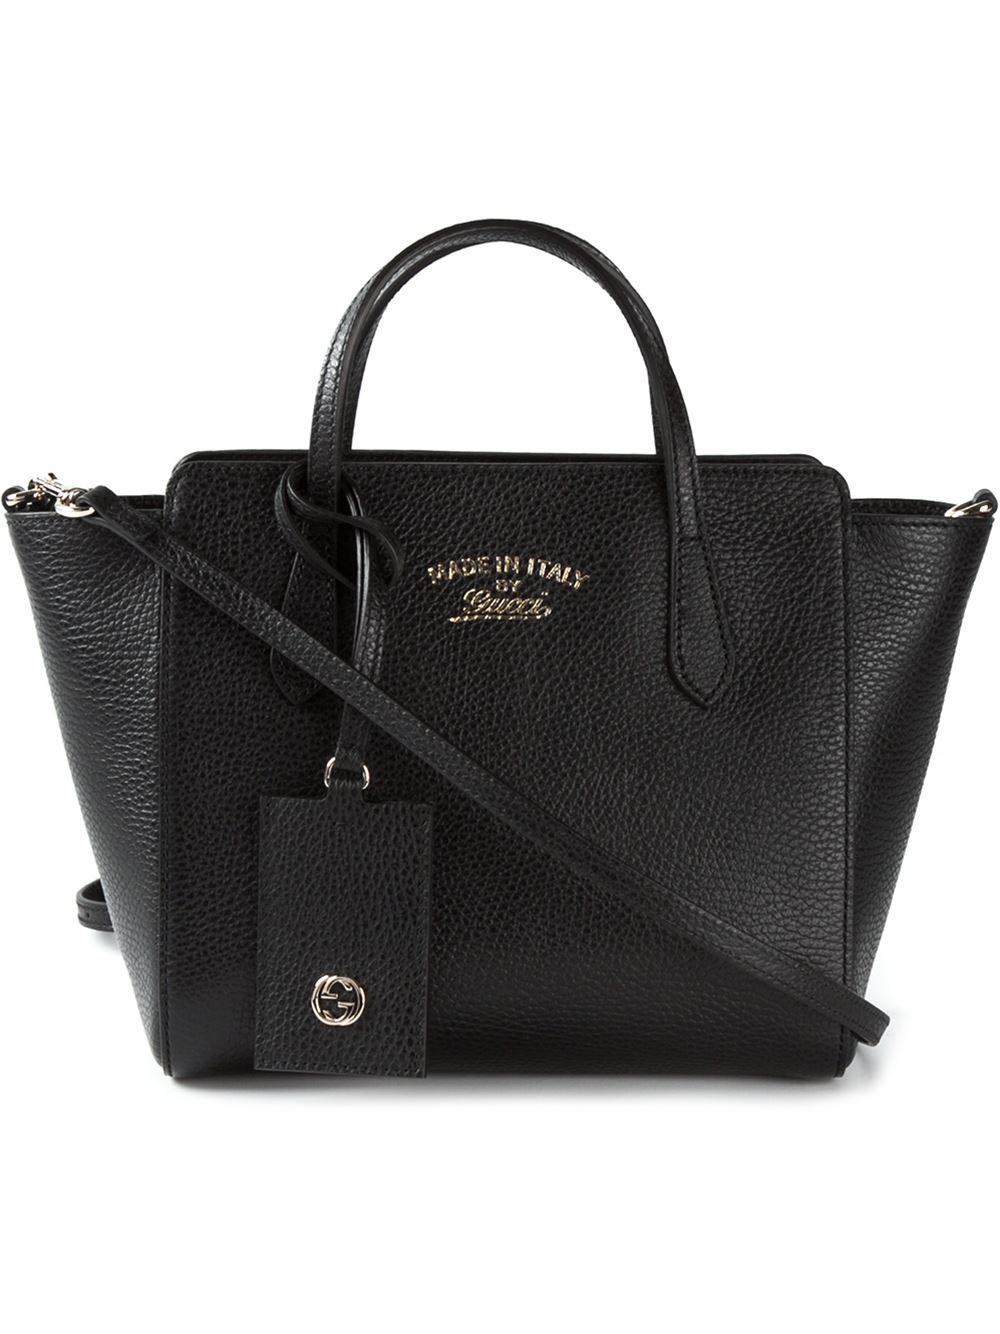 2102fa752b48ac Gucci Mini 'swing' Tote in Black - Lyst